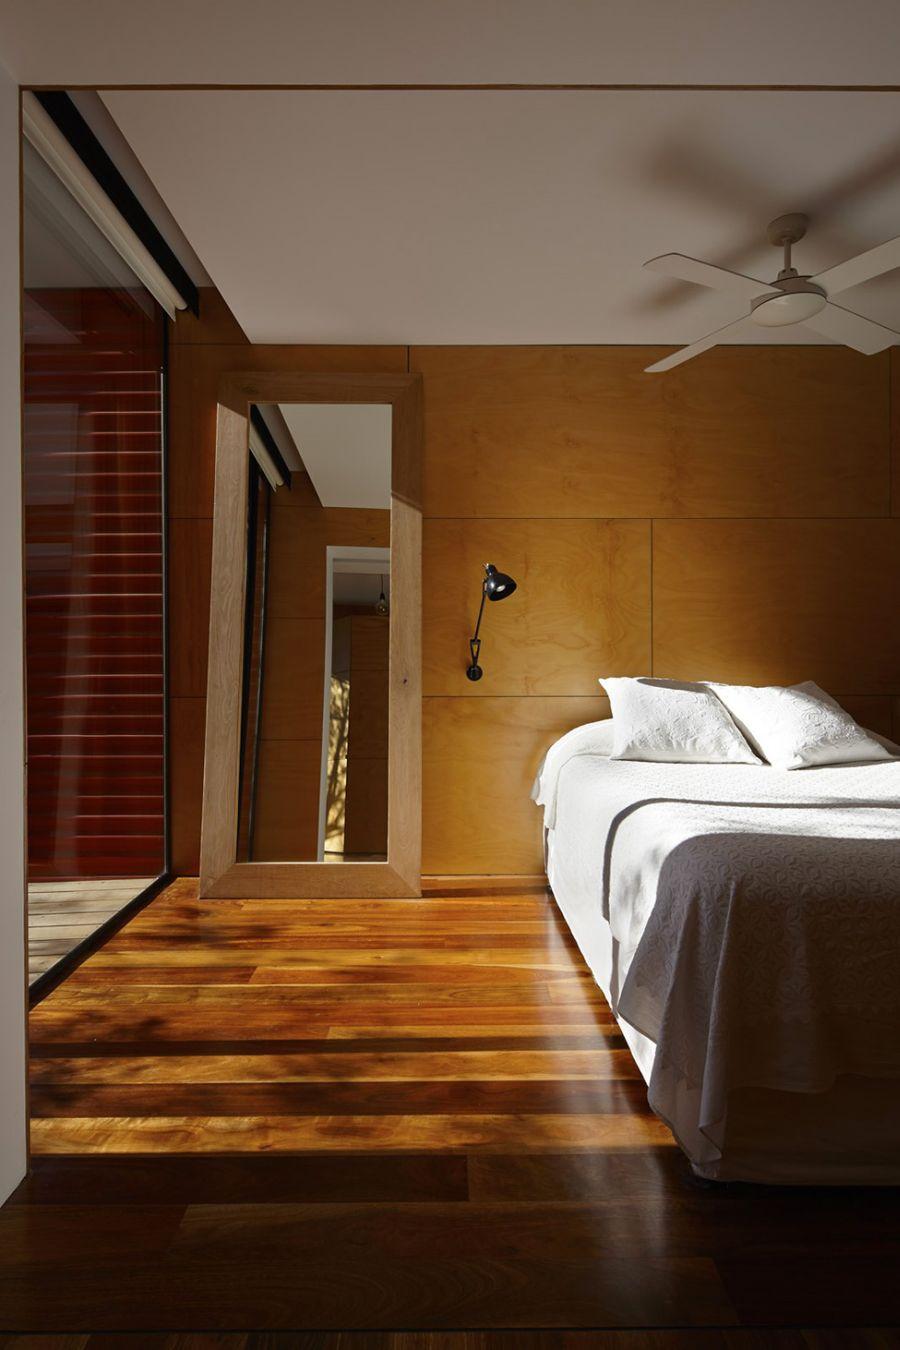 Sconce lighting in the bedroom